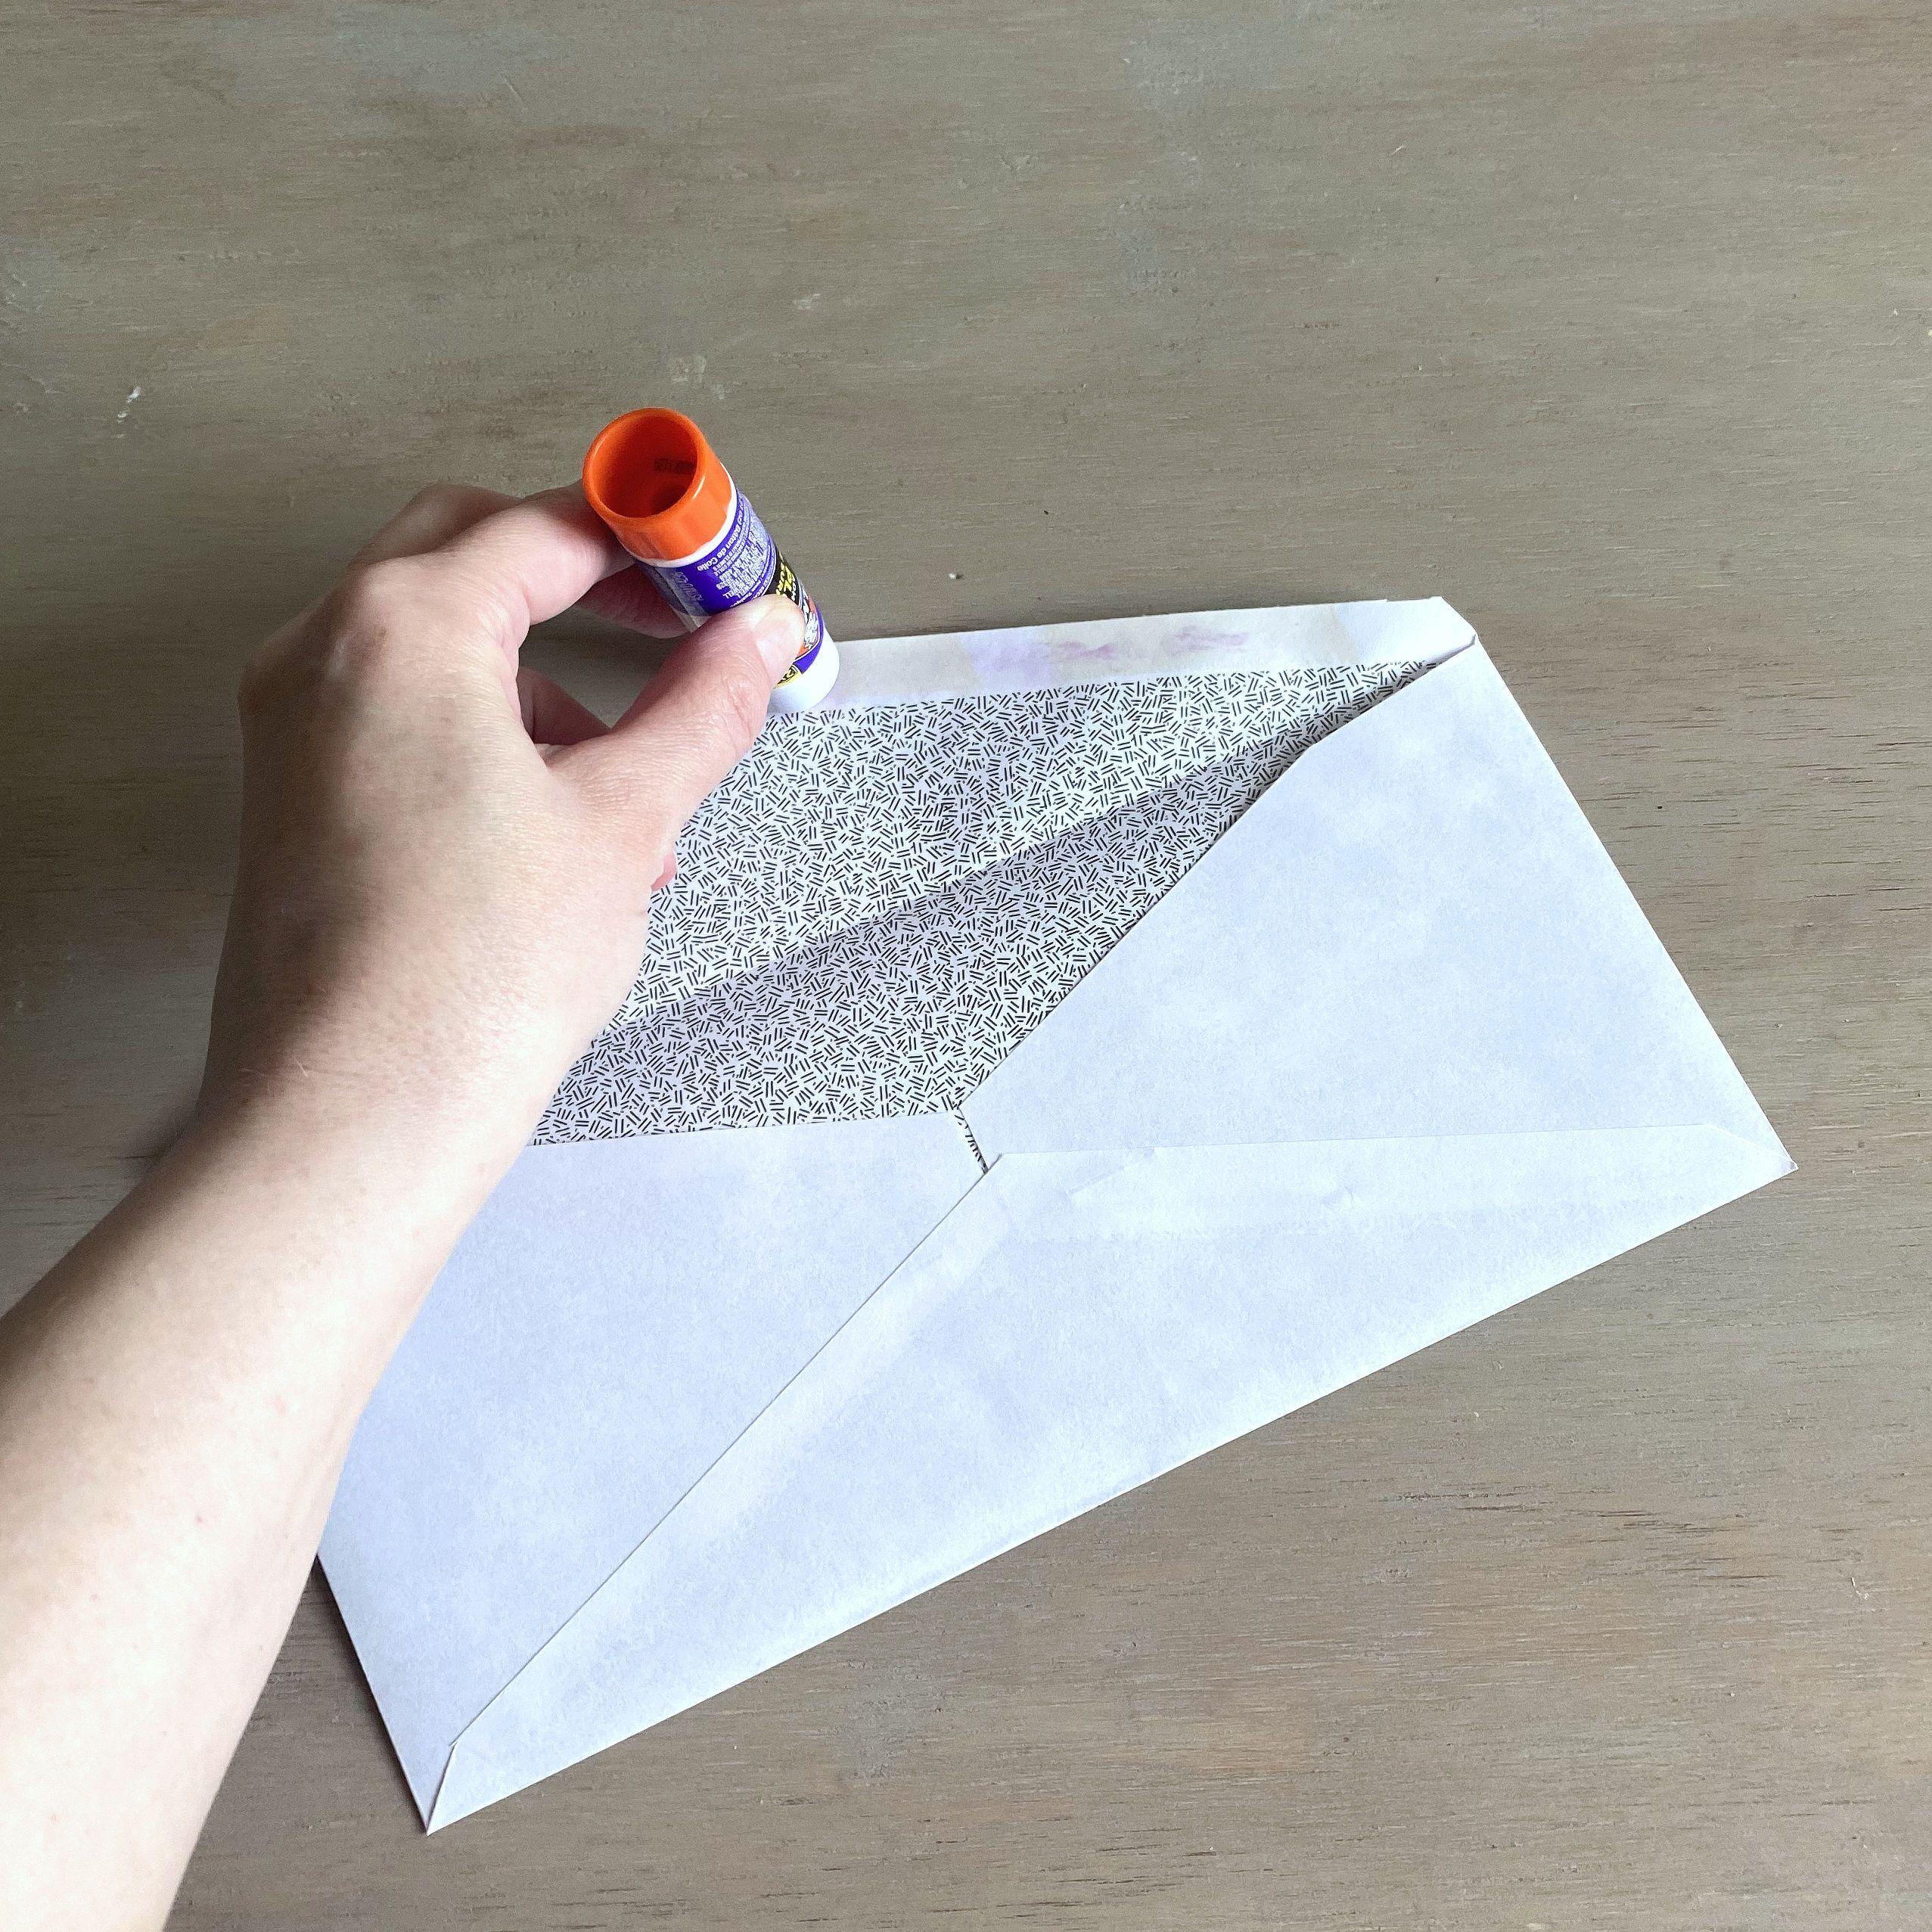 Hand applying glue stick to envelope